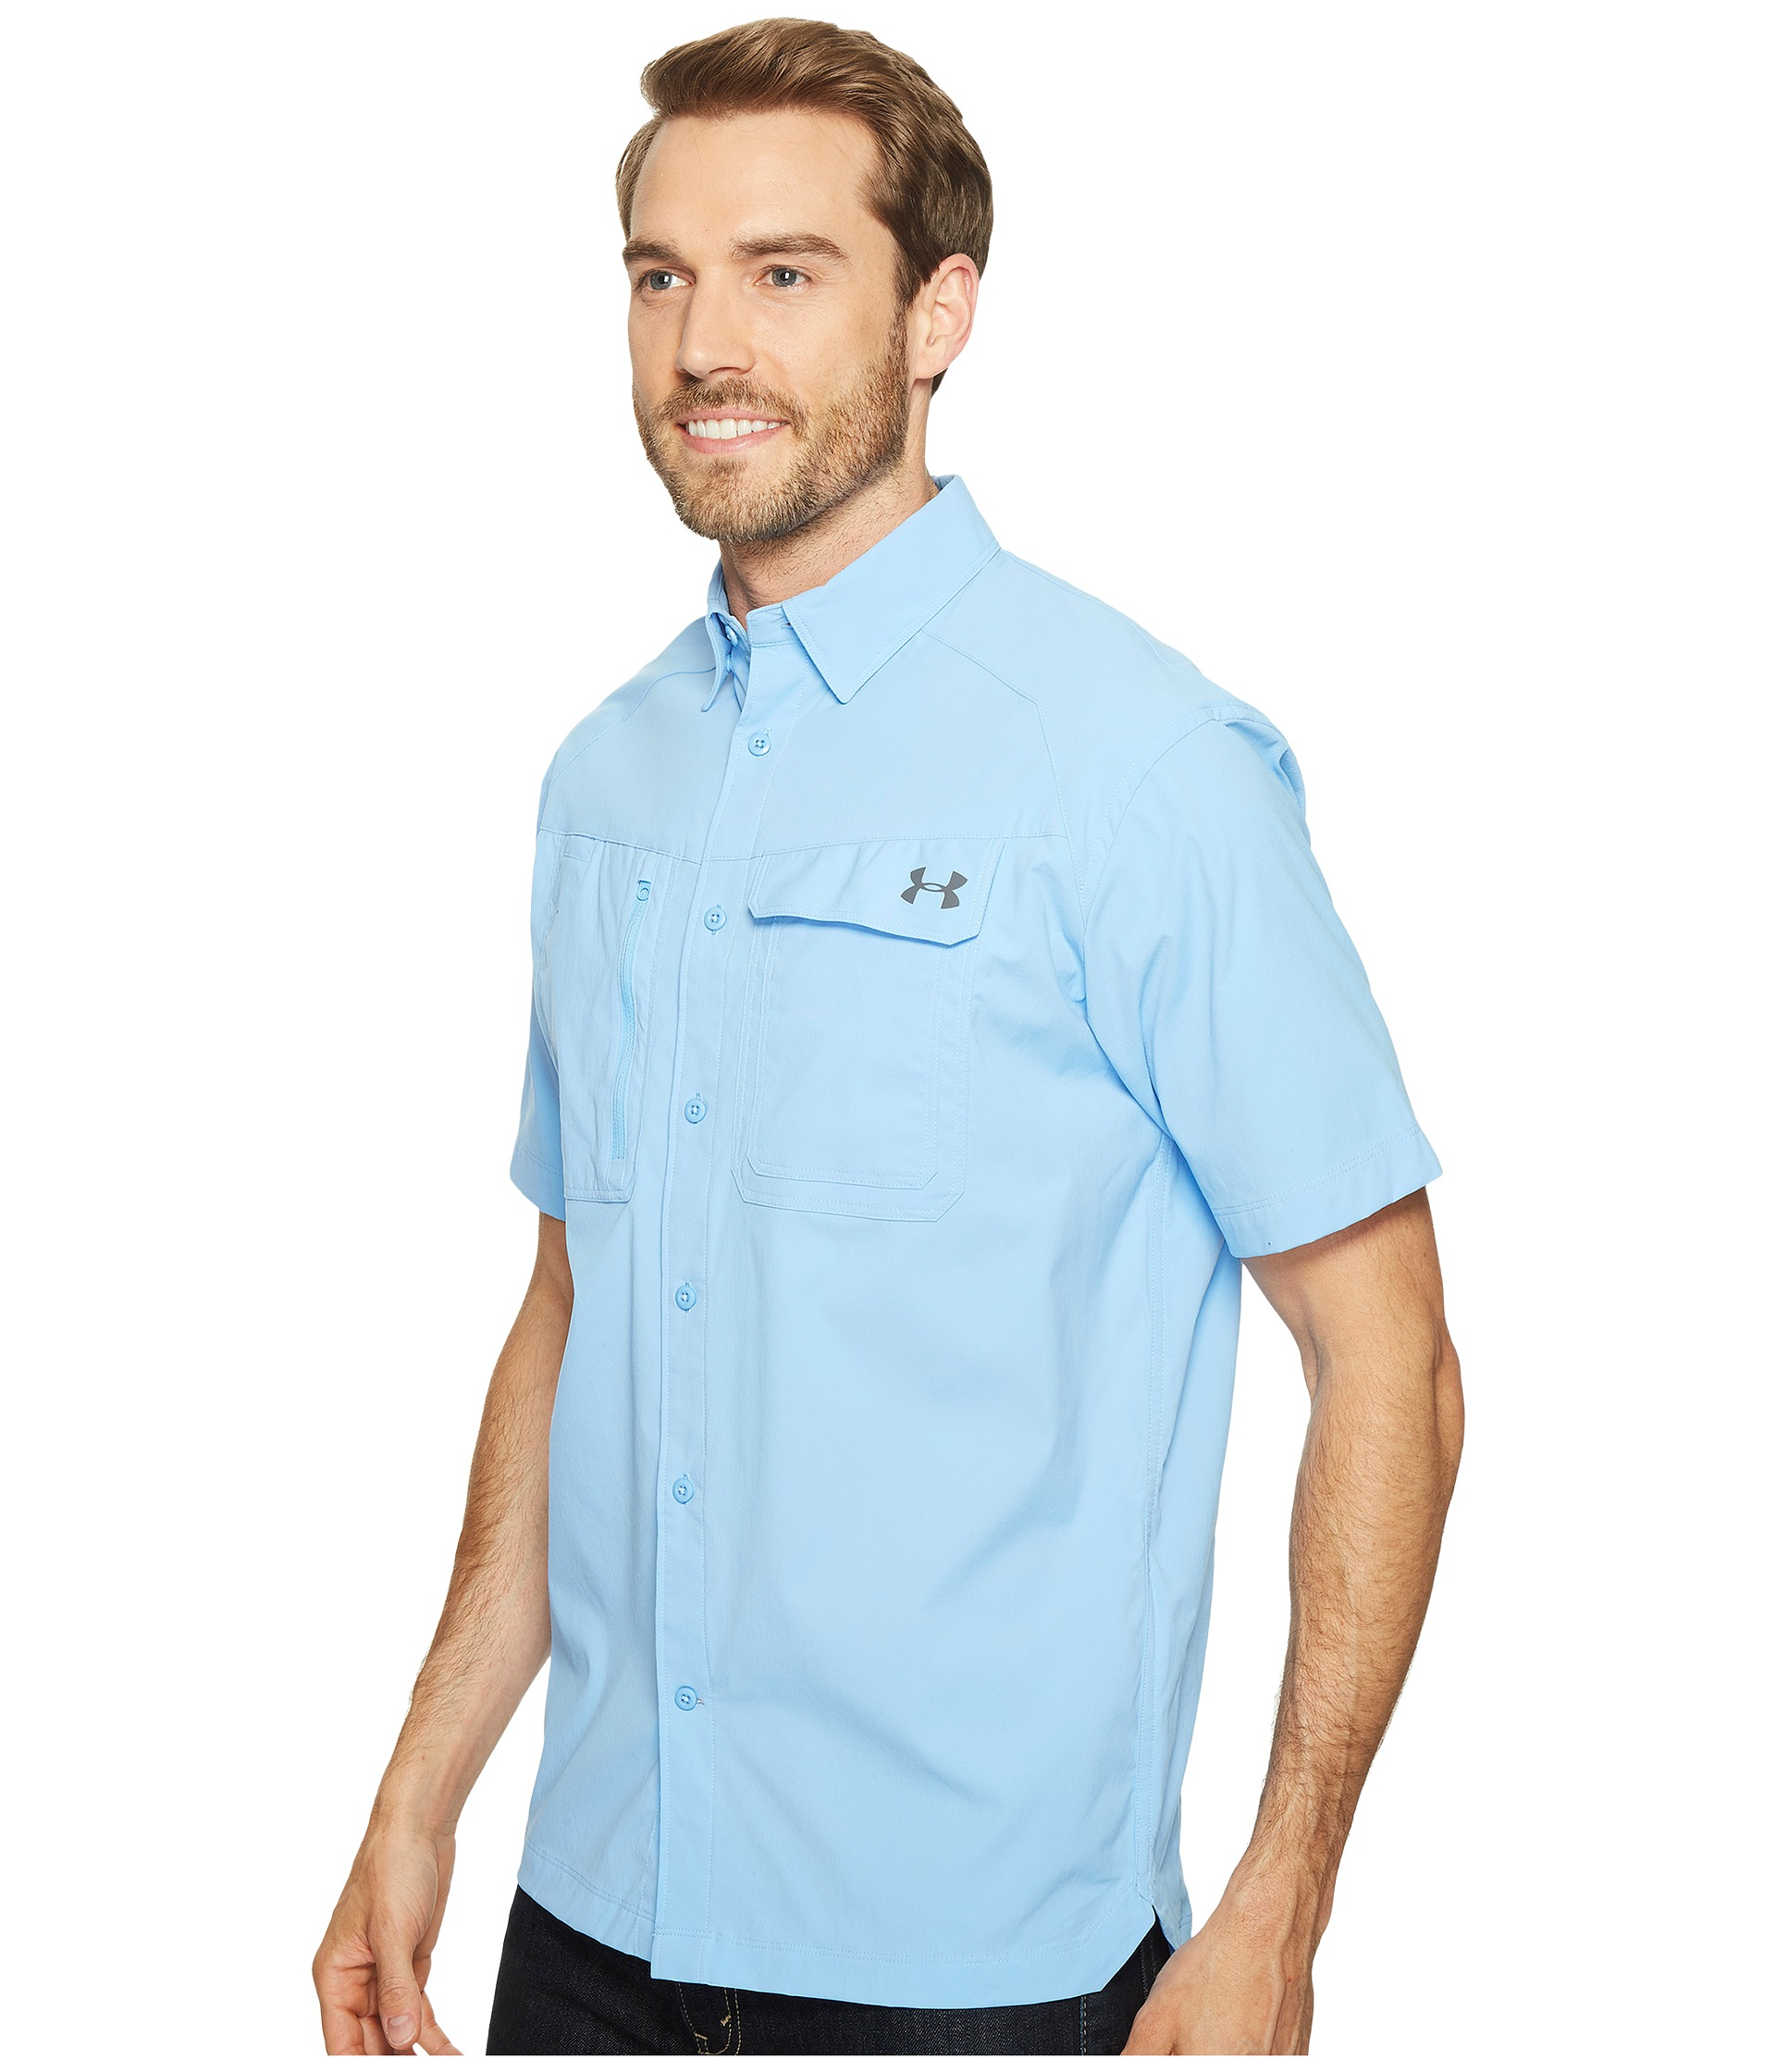 Under armour ua fish hunter short sleeve solid shirt at for Under armour fish hunter shirt